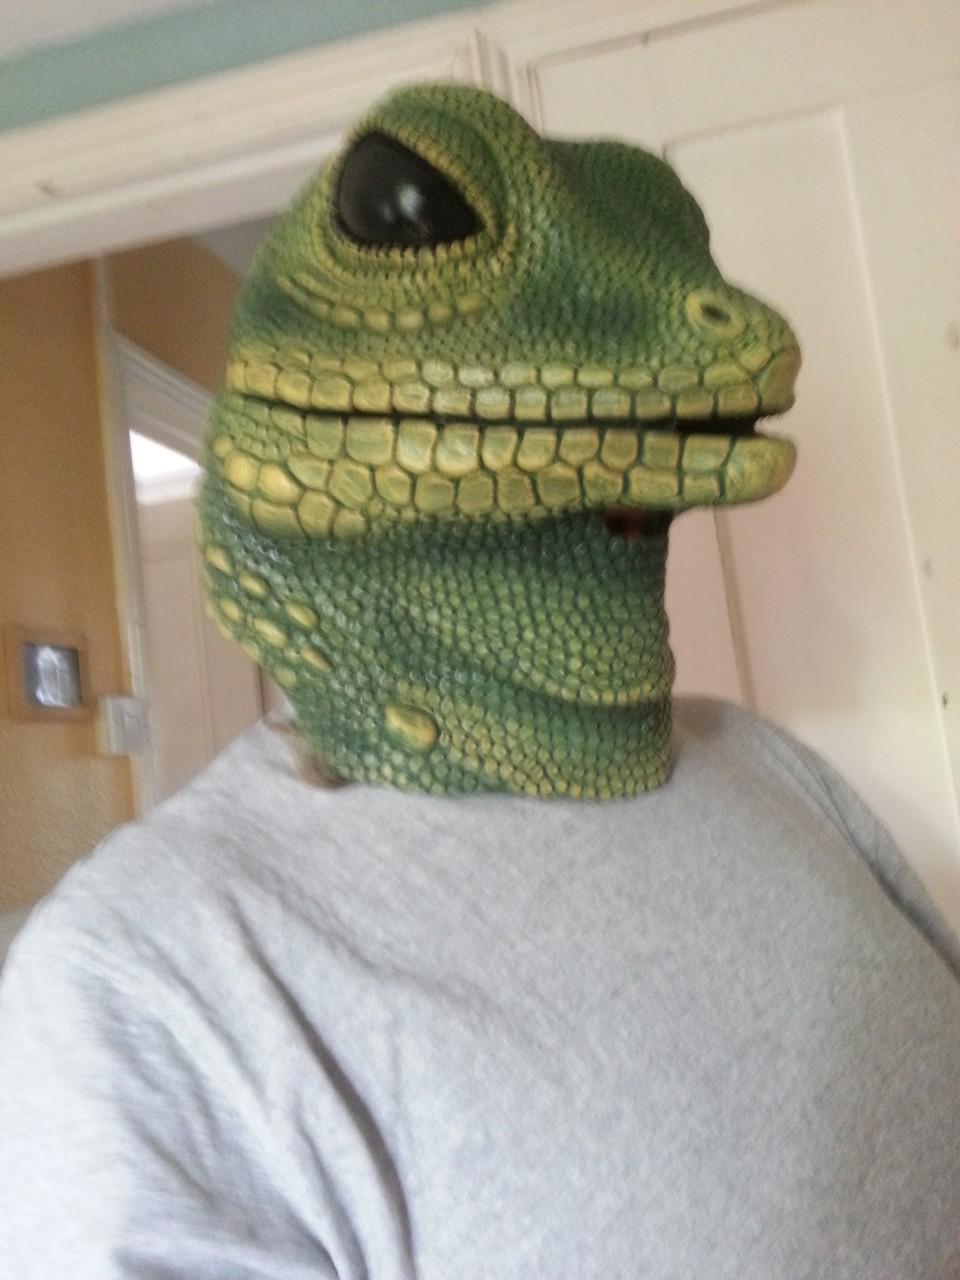 lizard mask 01